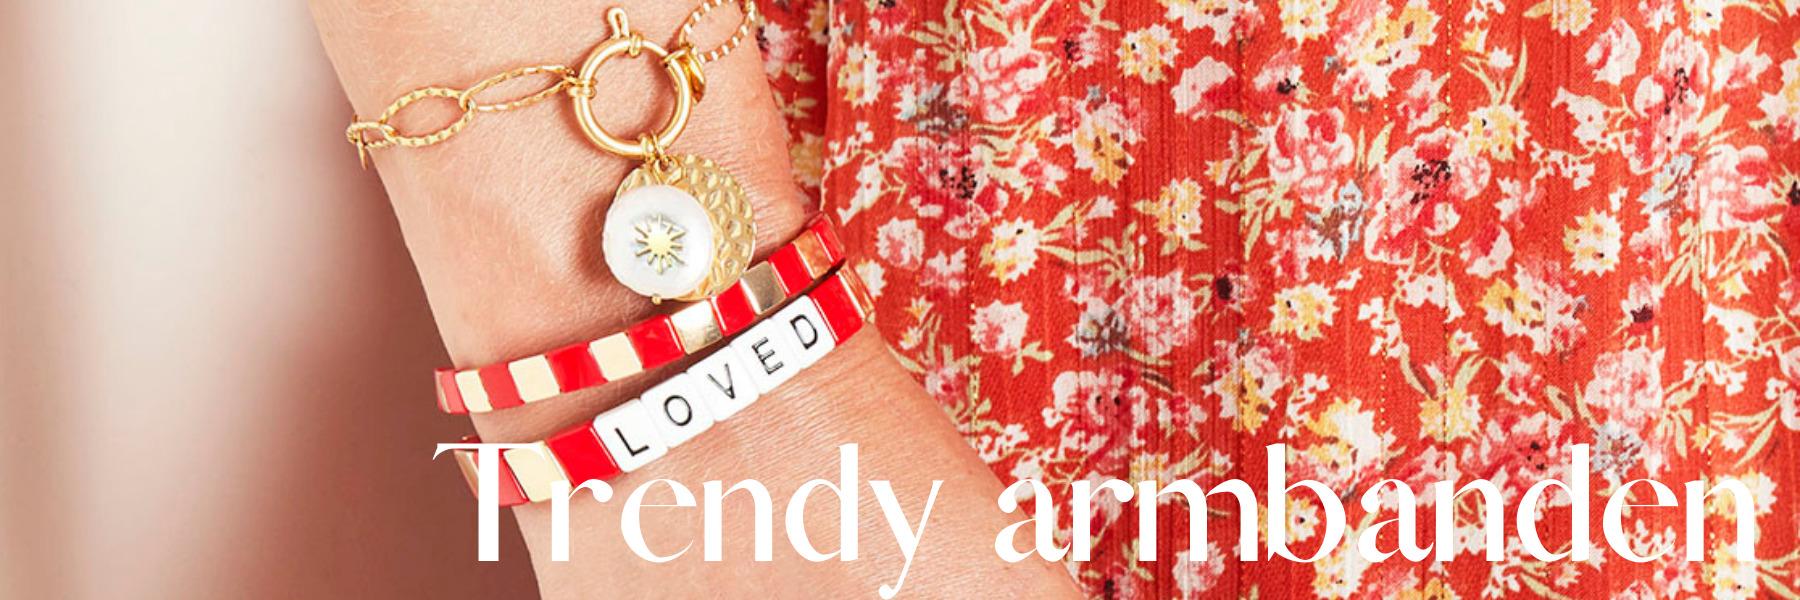 Trendy armbanden 3